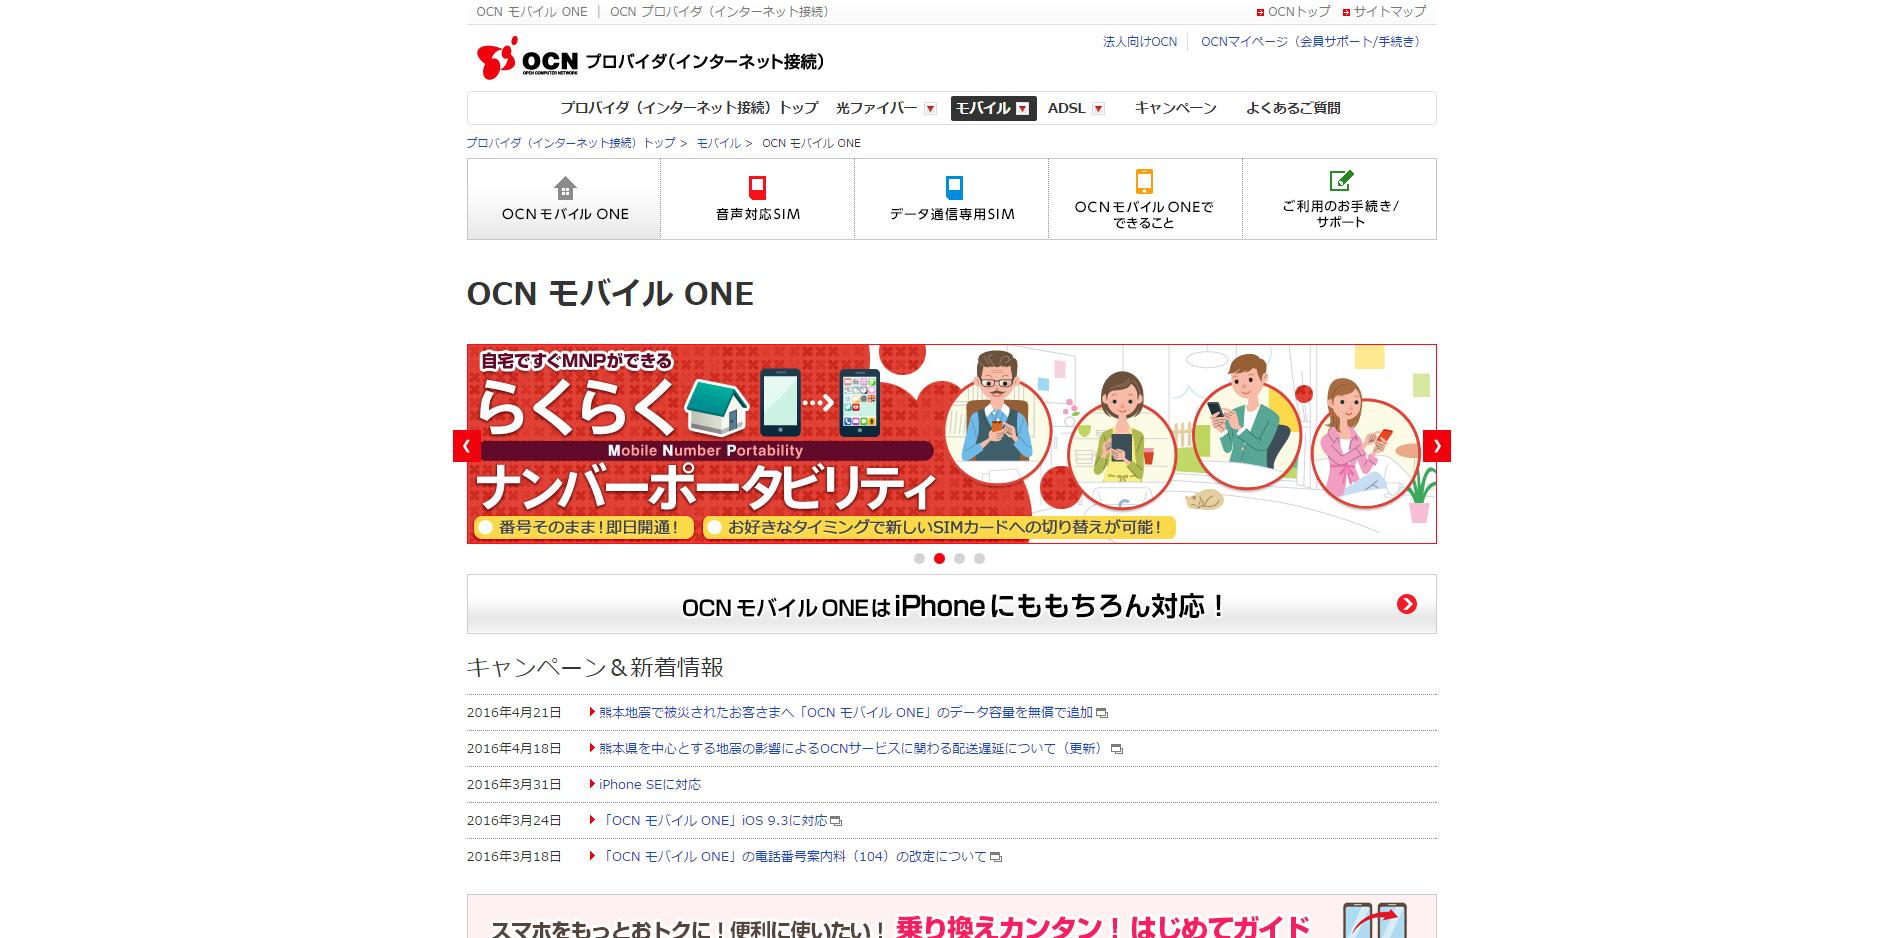 OCN モバイル ONE | OCN プロバイダ(インターネット接続)